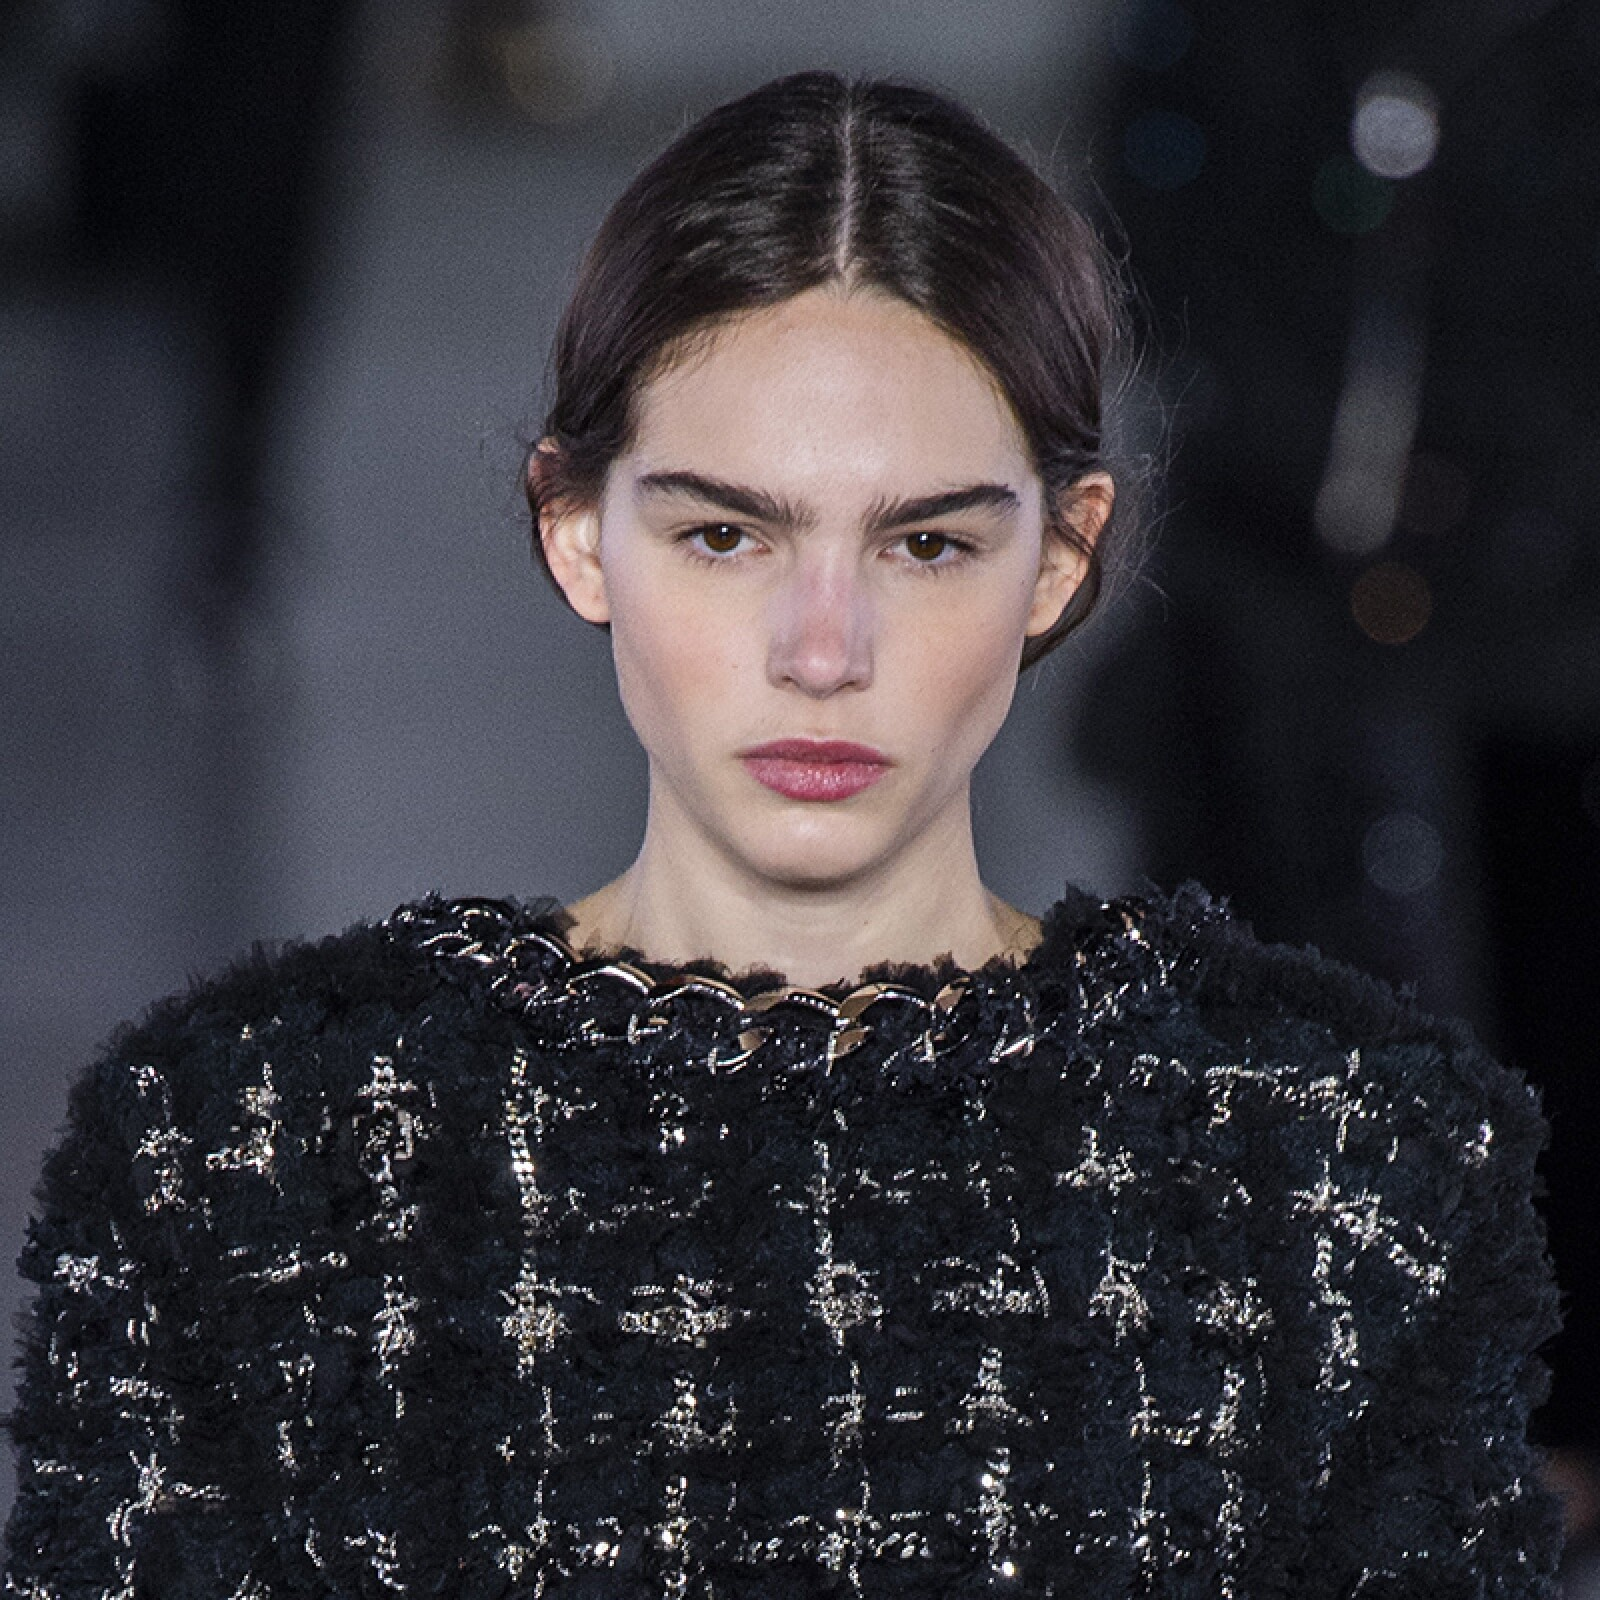 PFW-Paris-Fashion-Week-Runway-Pasarela-Beauty-Look-Belleza-Balmain